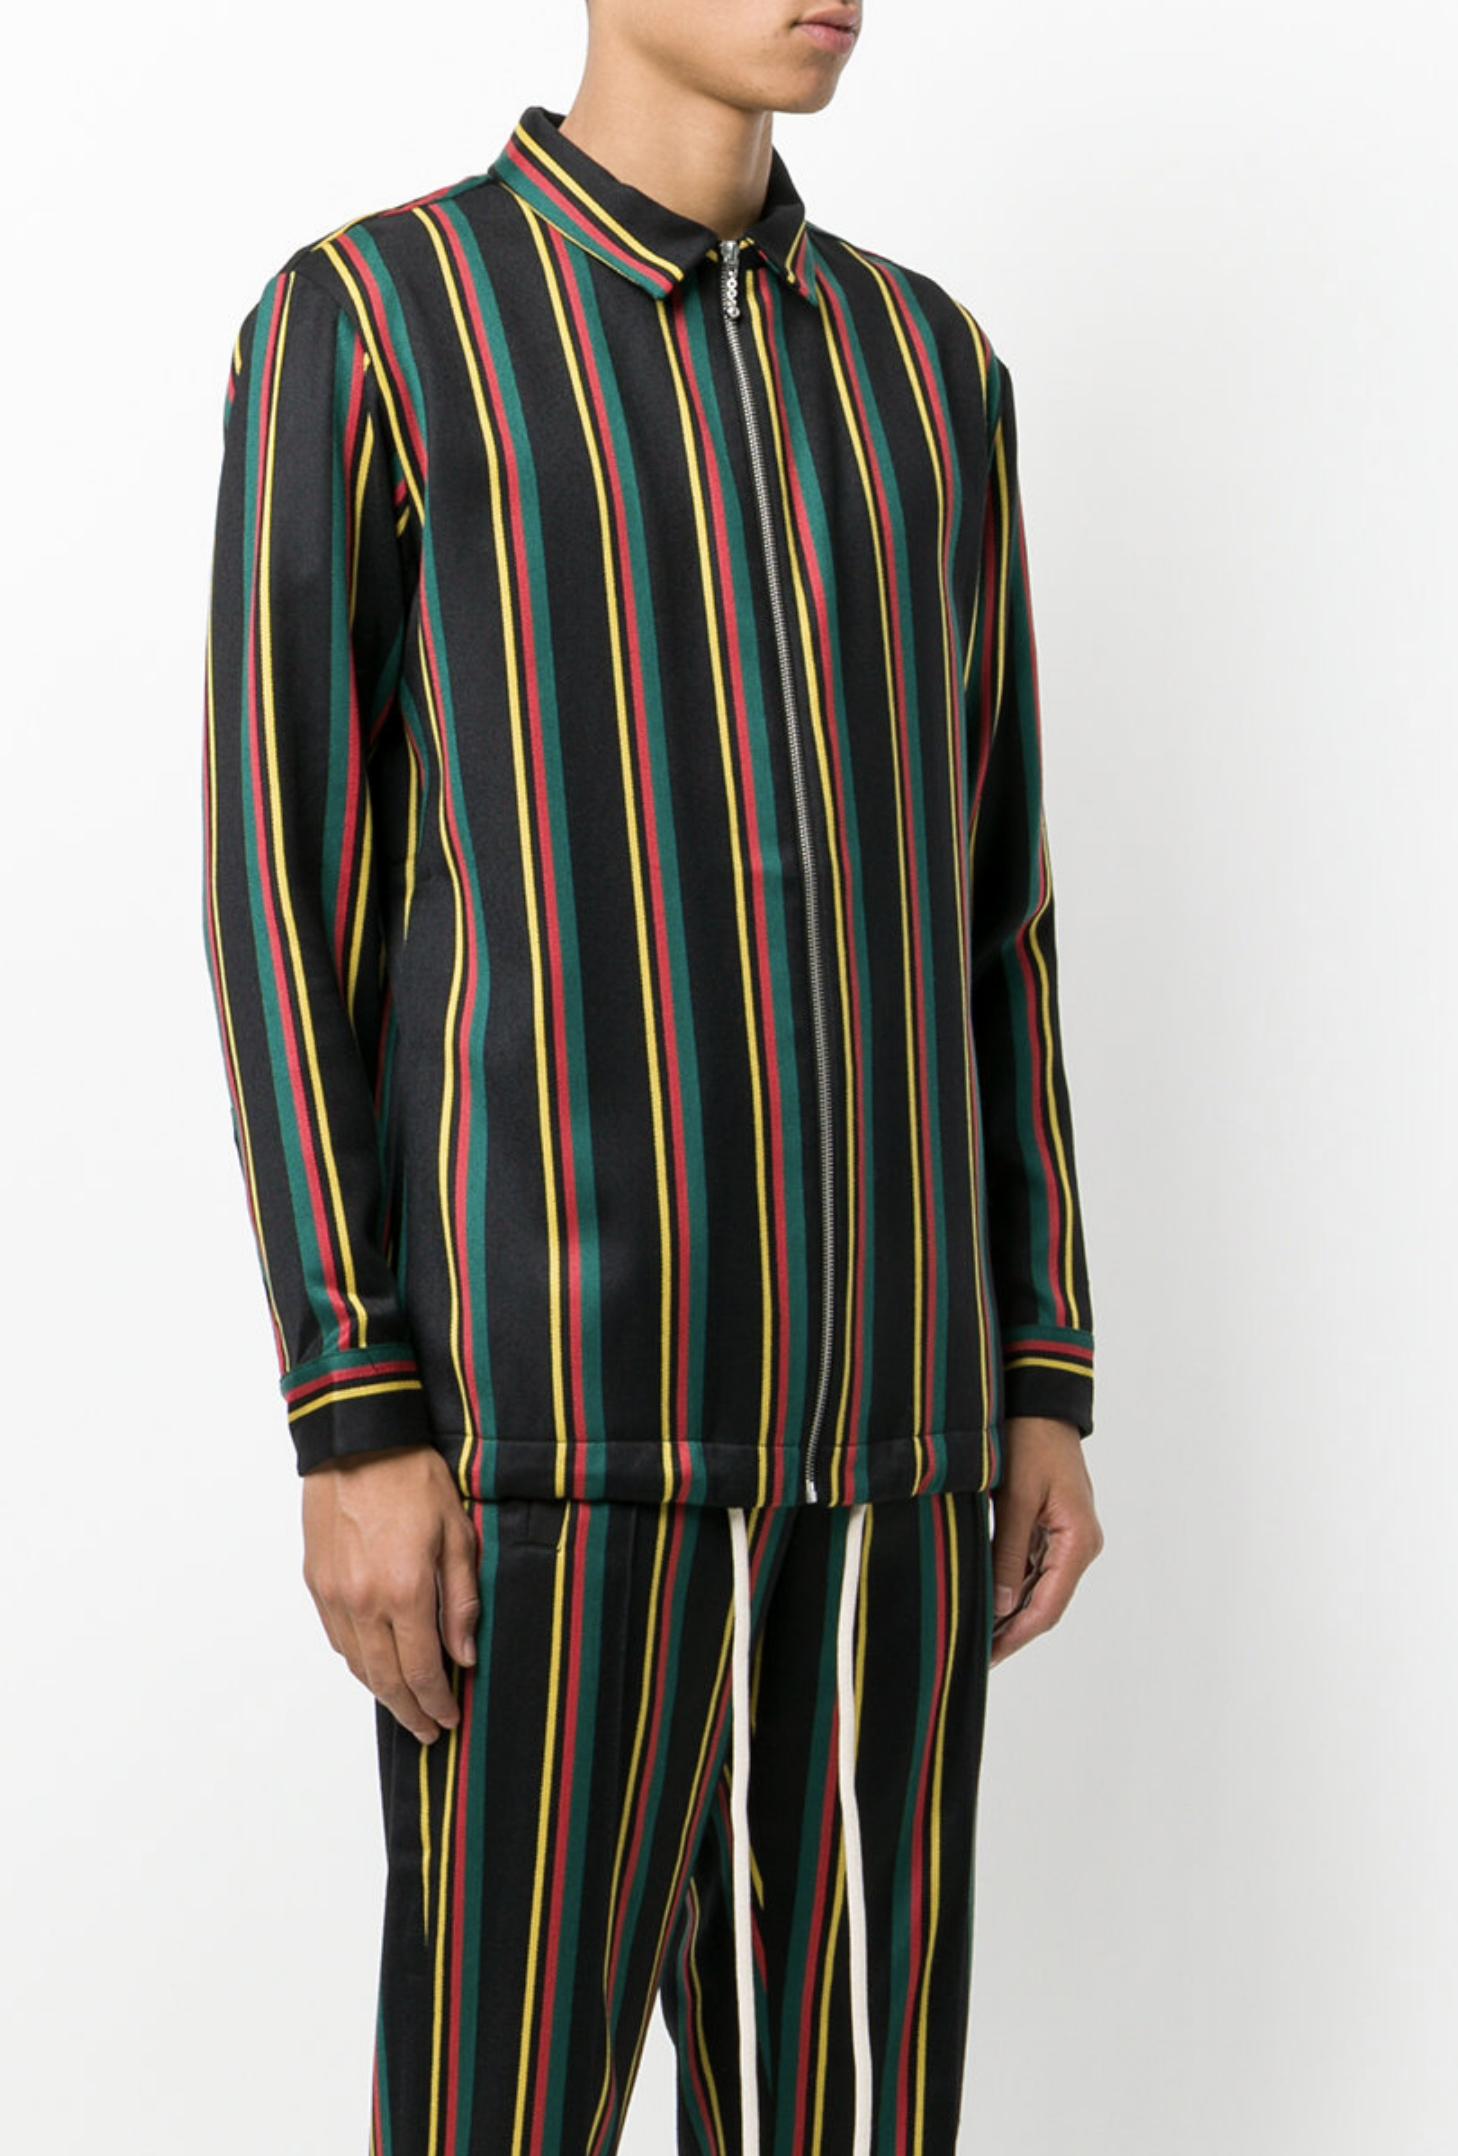 89255a696f5 PALM ANGELS zipped stripe jacket from Farfetch (men